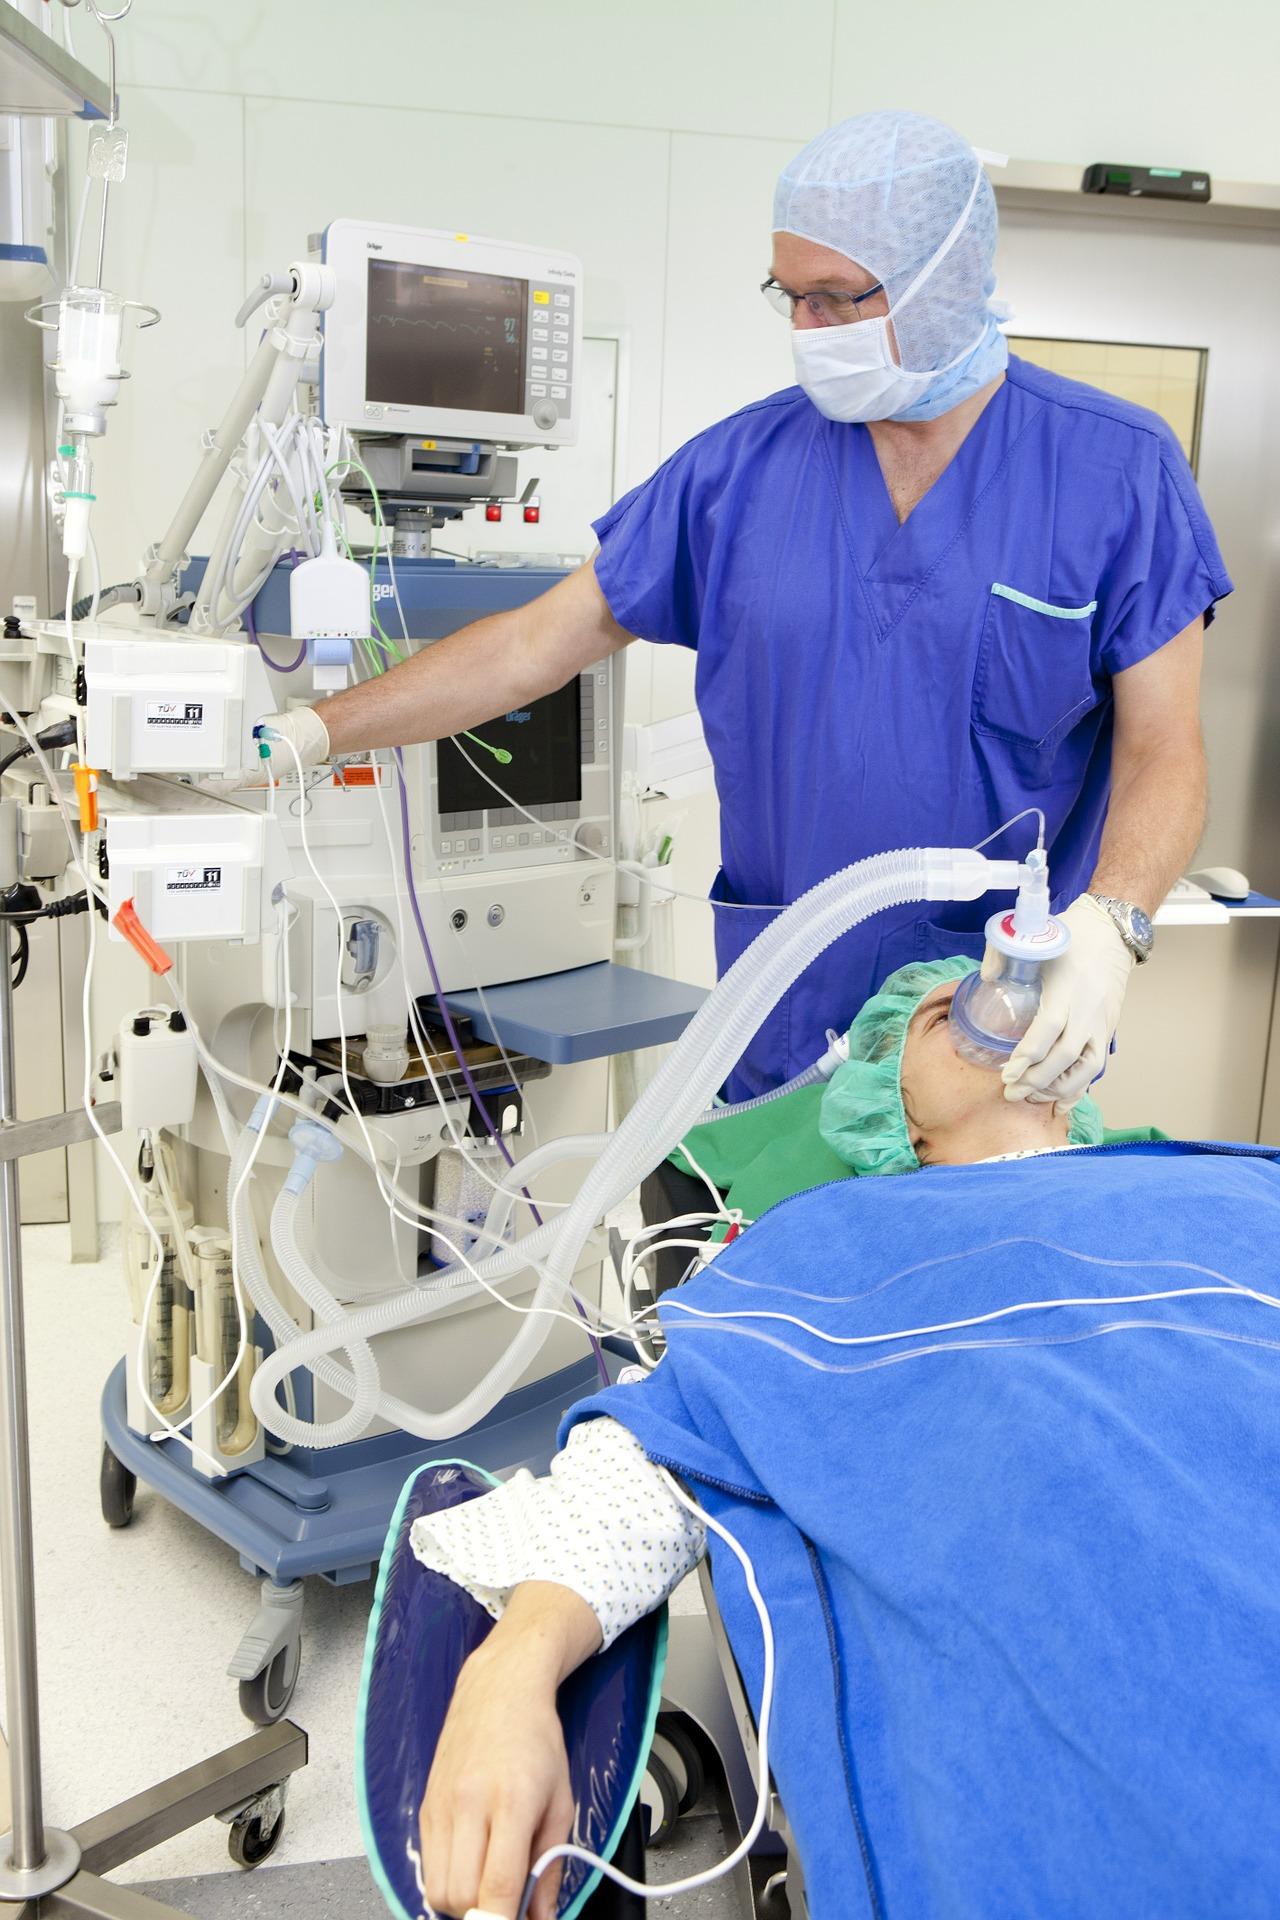 anastæsi læge kirurg hospital